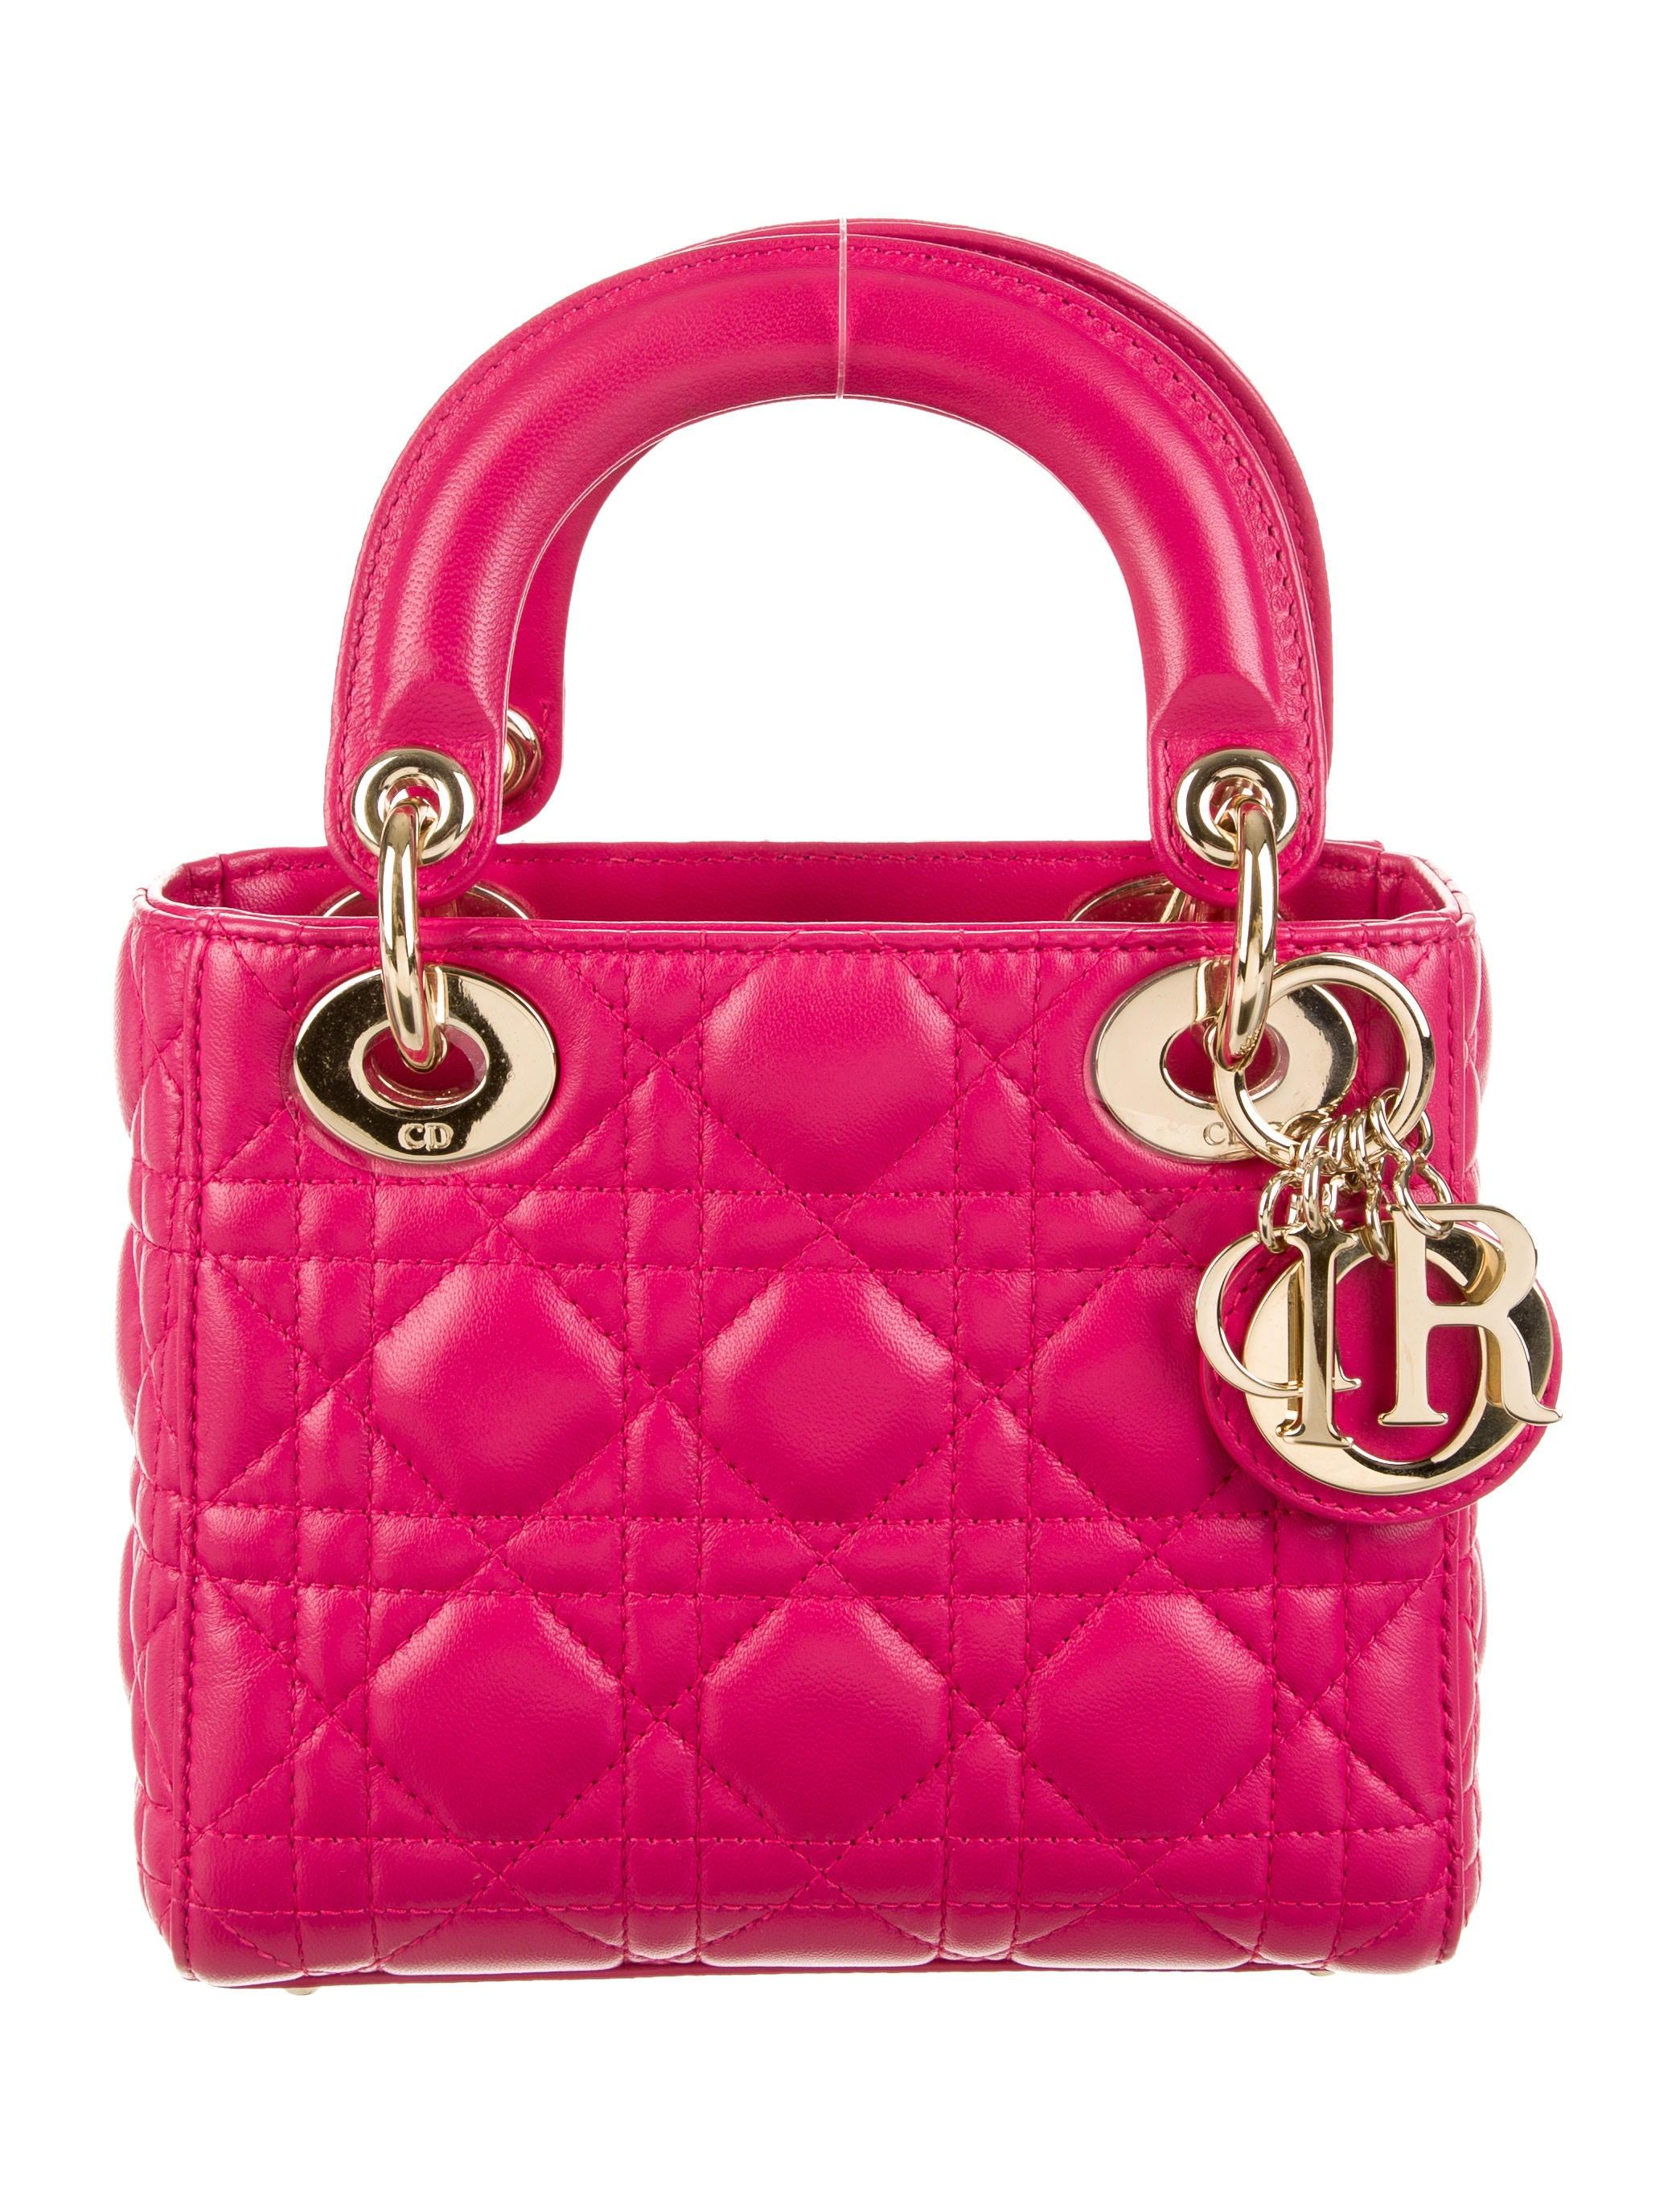 christian dior mini lady dior bag handbags chr33463 the realreal. Black Bedroom Furniture Sets. Home Design Ideas